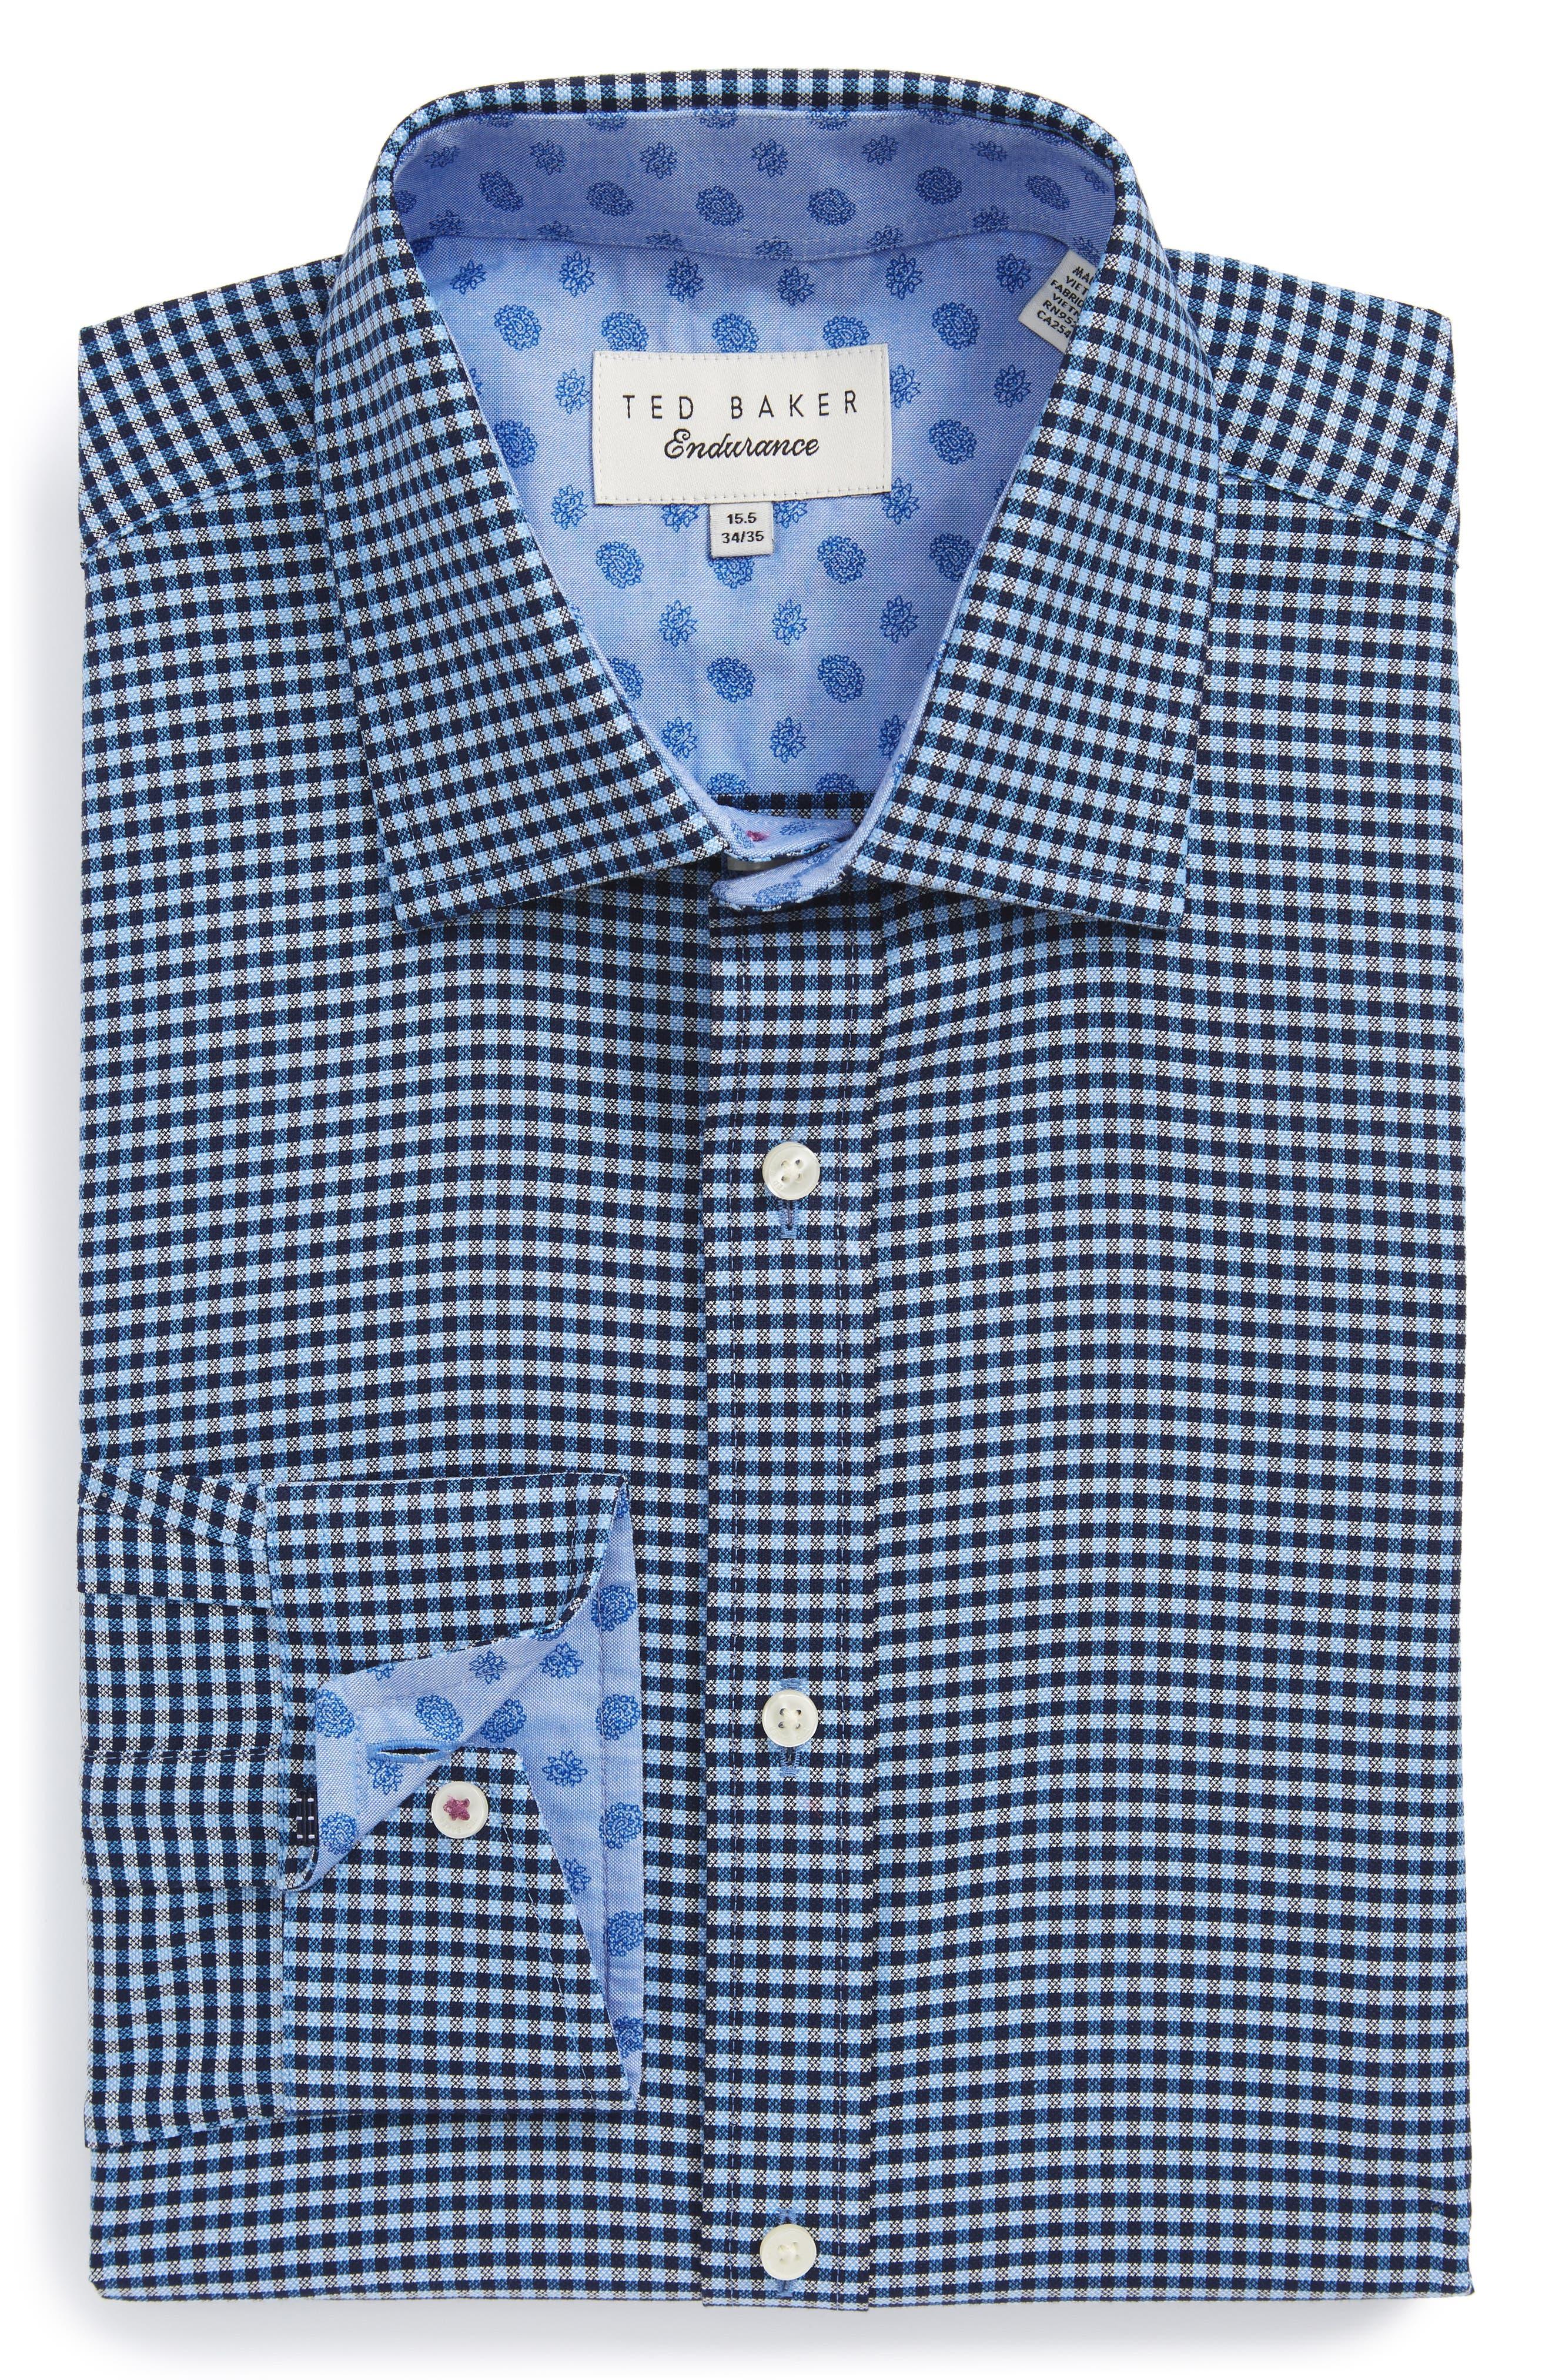 Endurance Sterling Trim Fit Dress Shirt,                             Main thumbnail 1, color,                             Blue